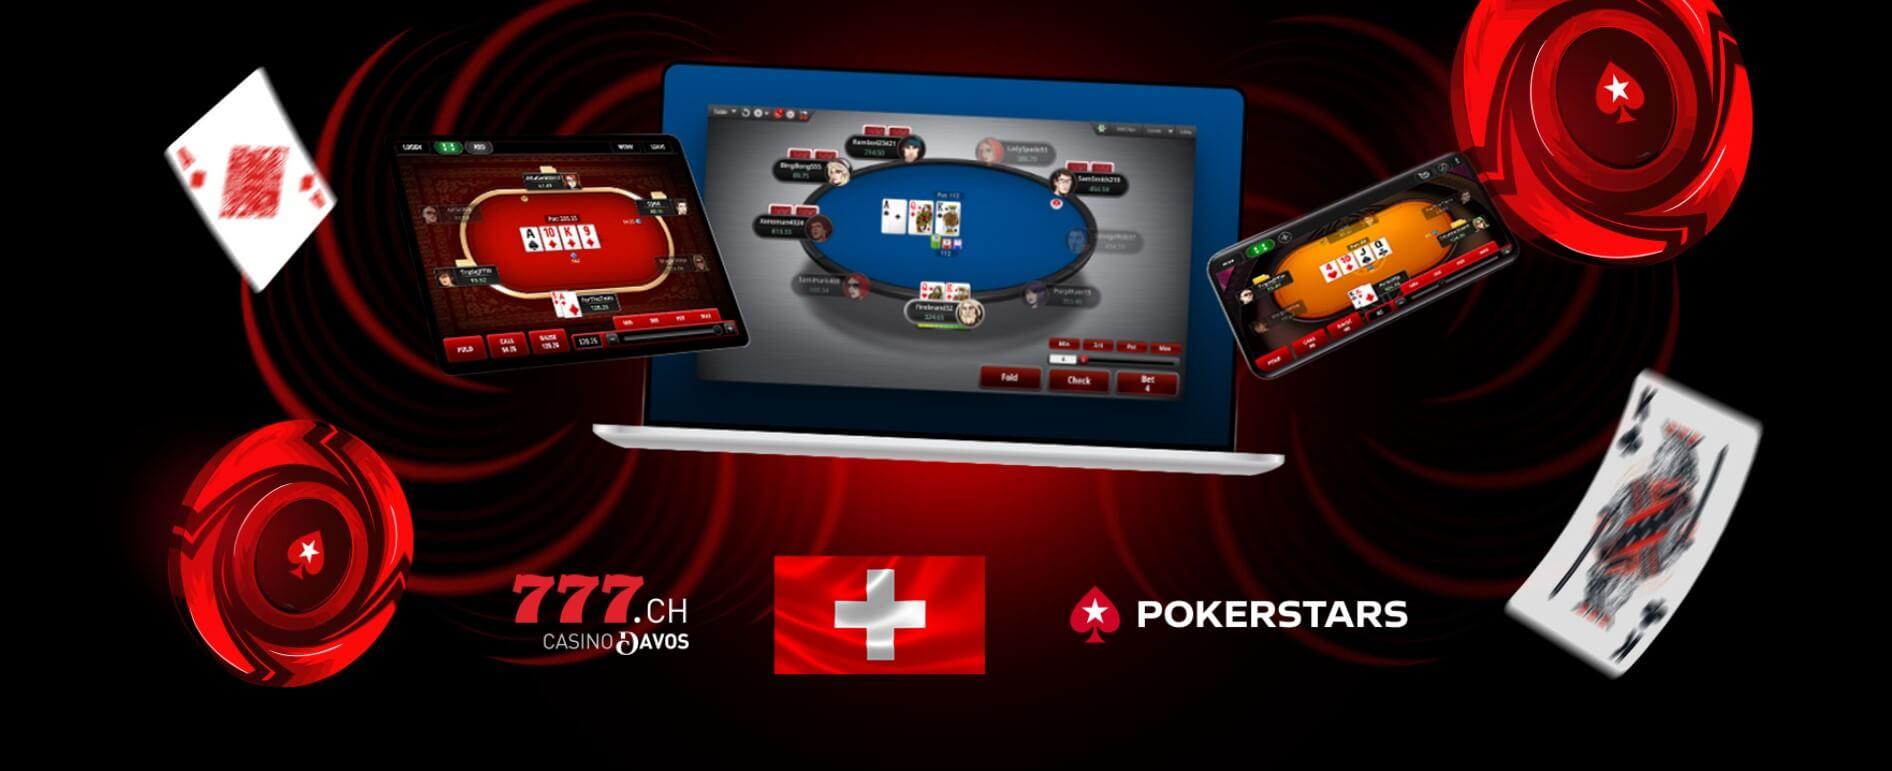 Pokerstars.ch